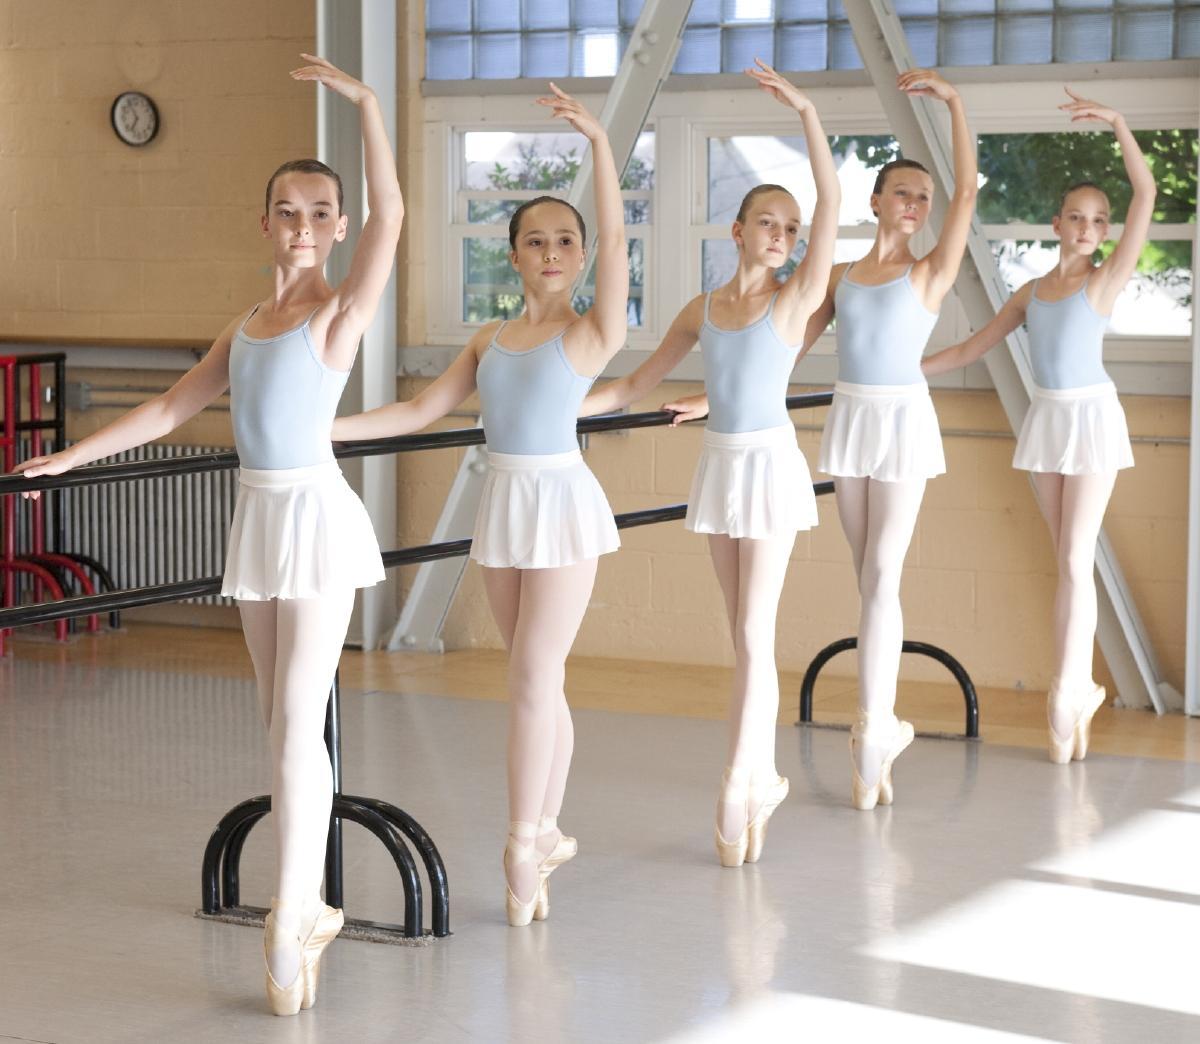 Rainbow的Live:学习芭蕾多久可以上足尖?